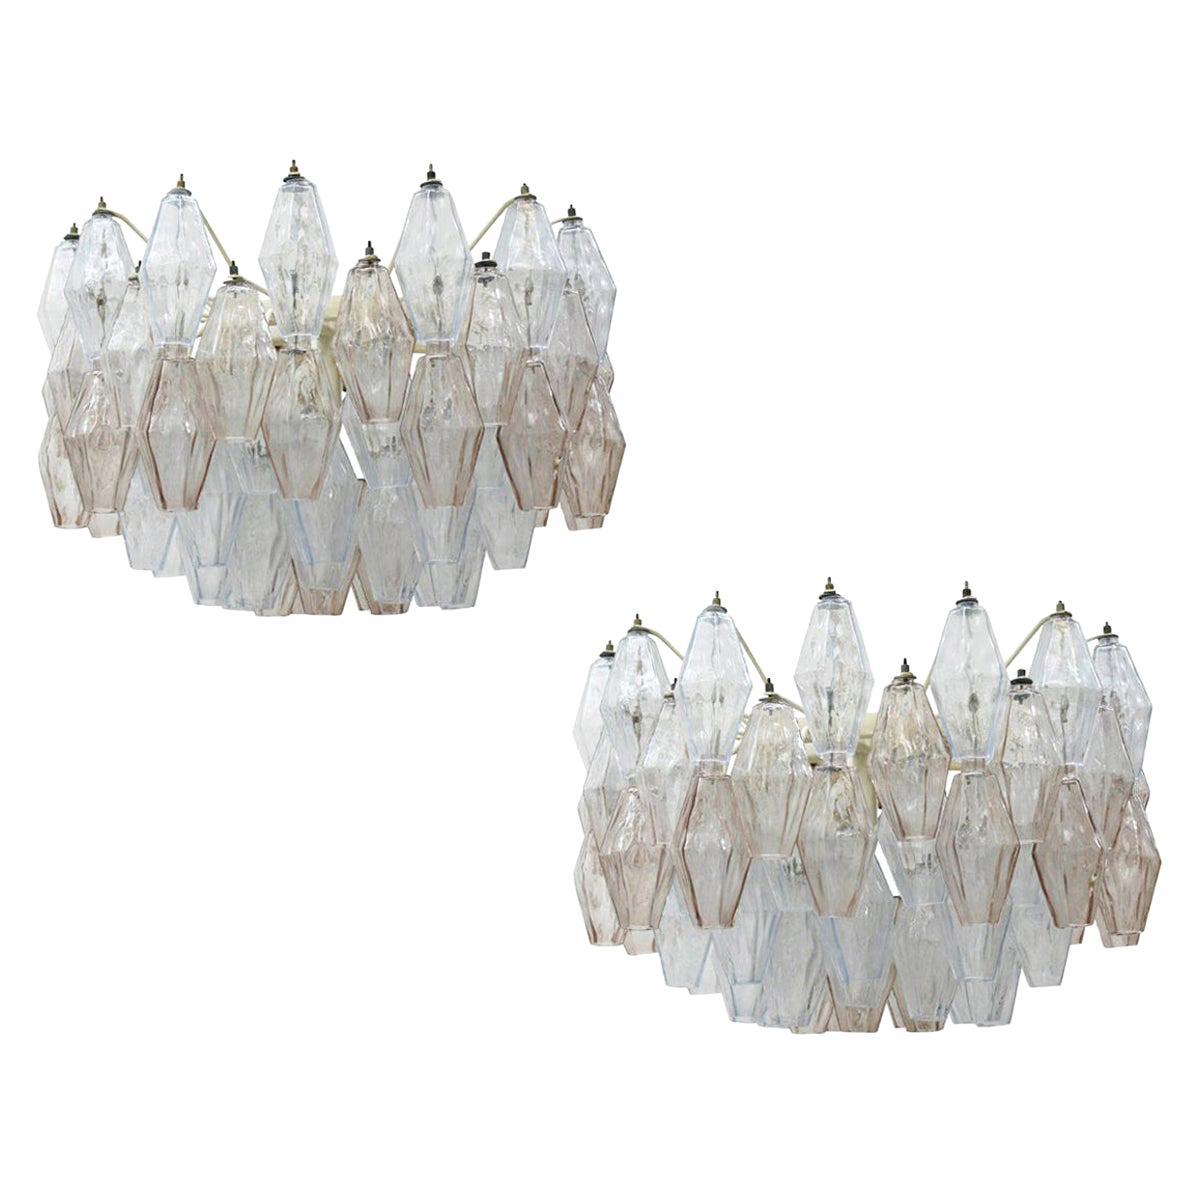 Carlo Scarpa Mid-Century Modern Venini Pair of Murano Glass Poliedri Lamps